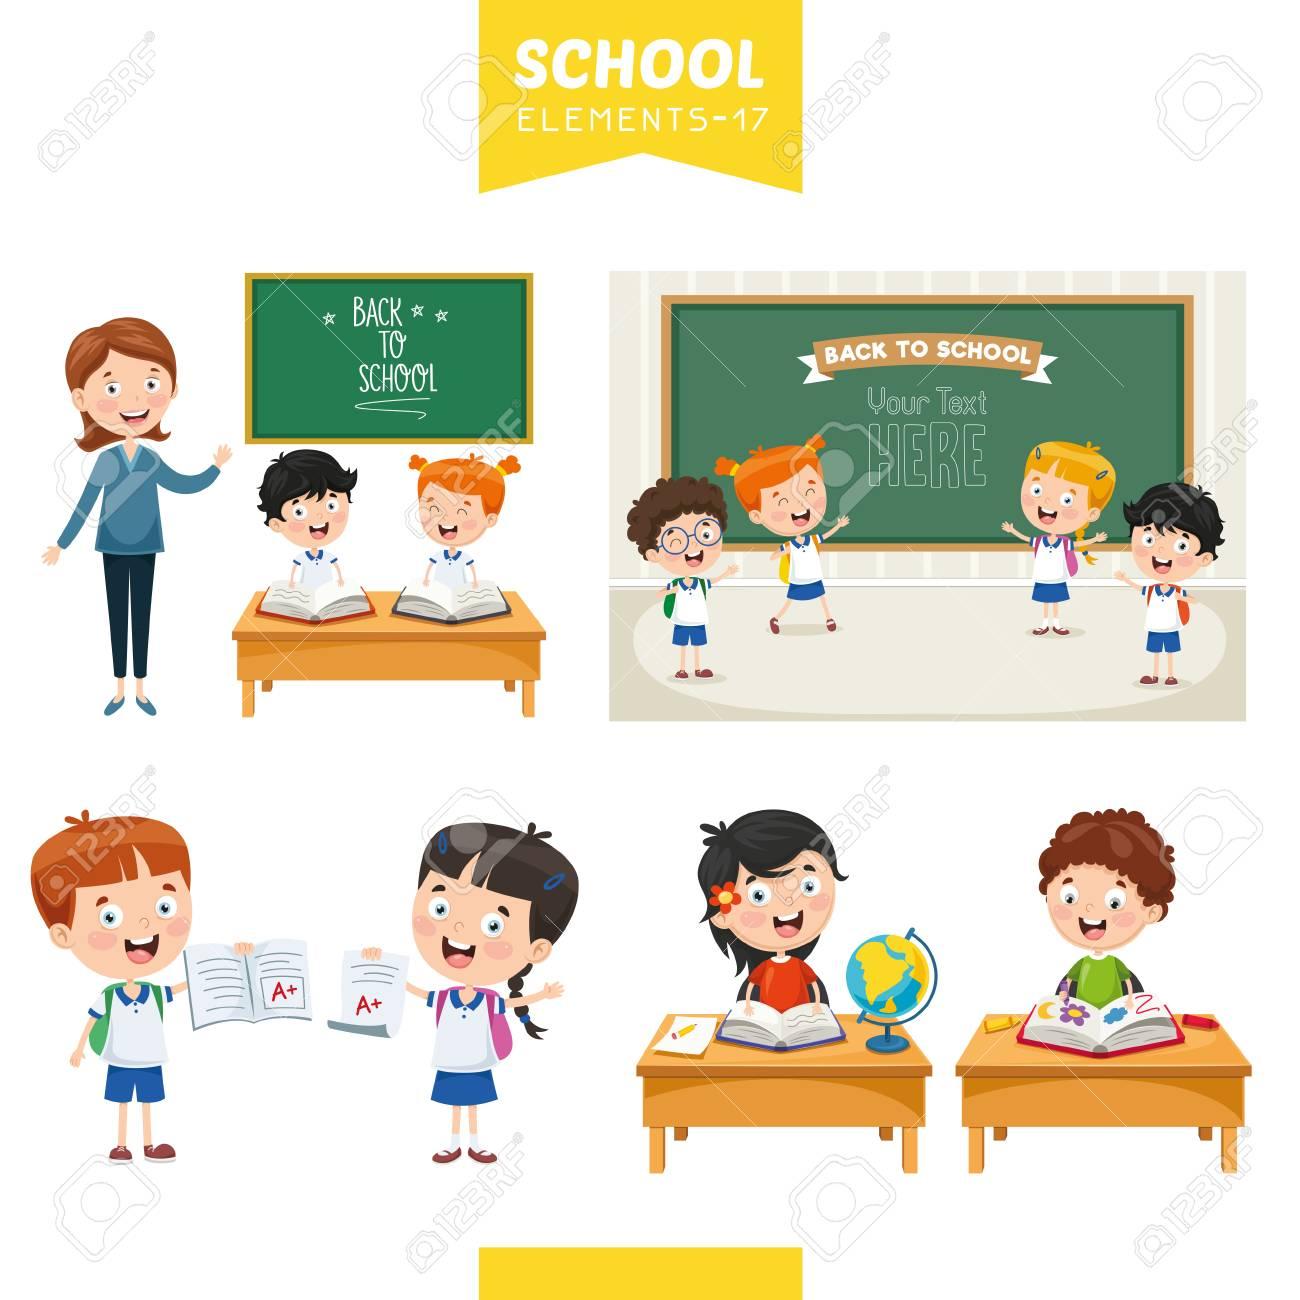 Vector Illustration Of Education Elements - 112919328